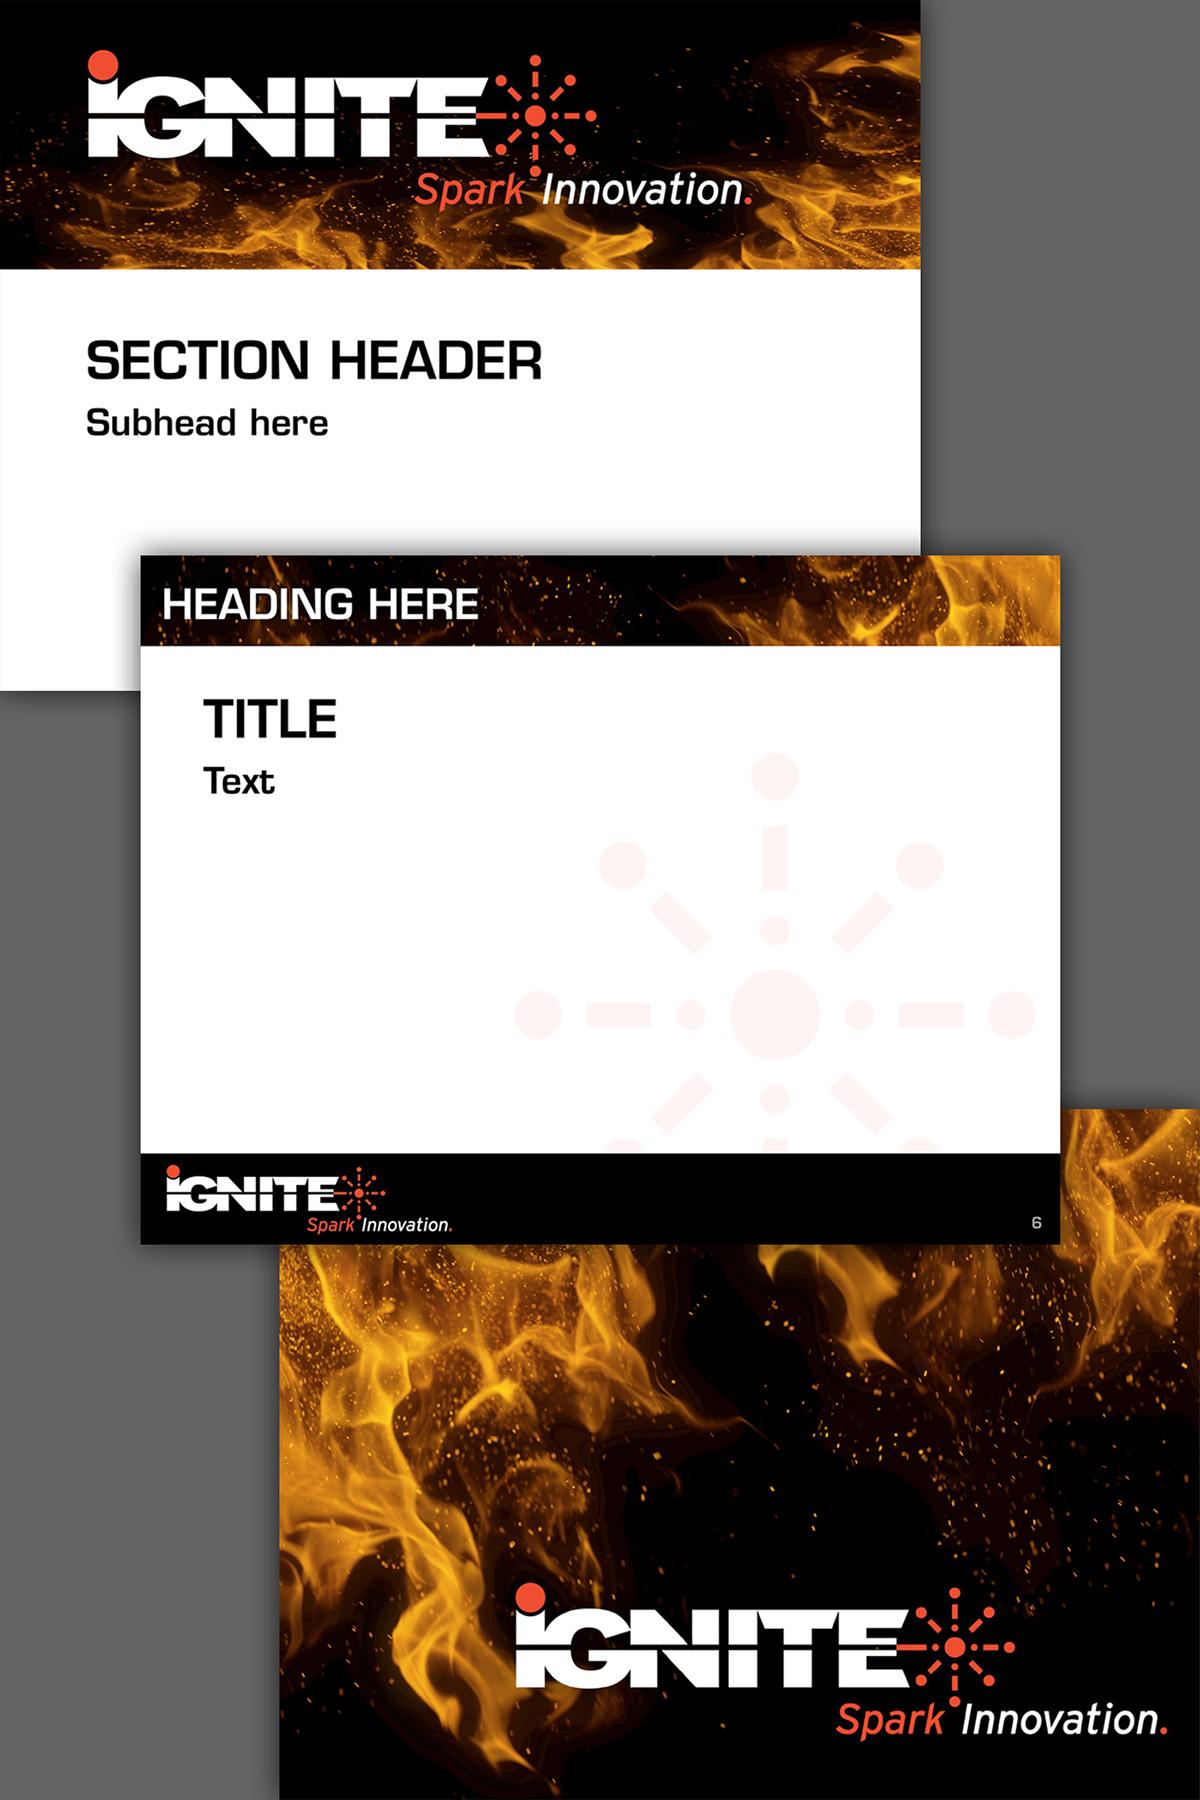 IGNITE: Brand Identity   PPT   Graphics   Posters on Pratt Portfolios